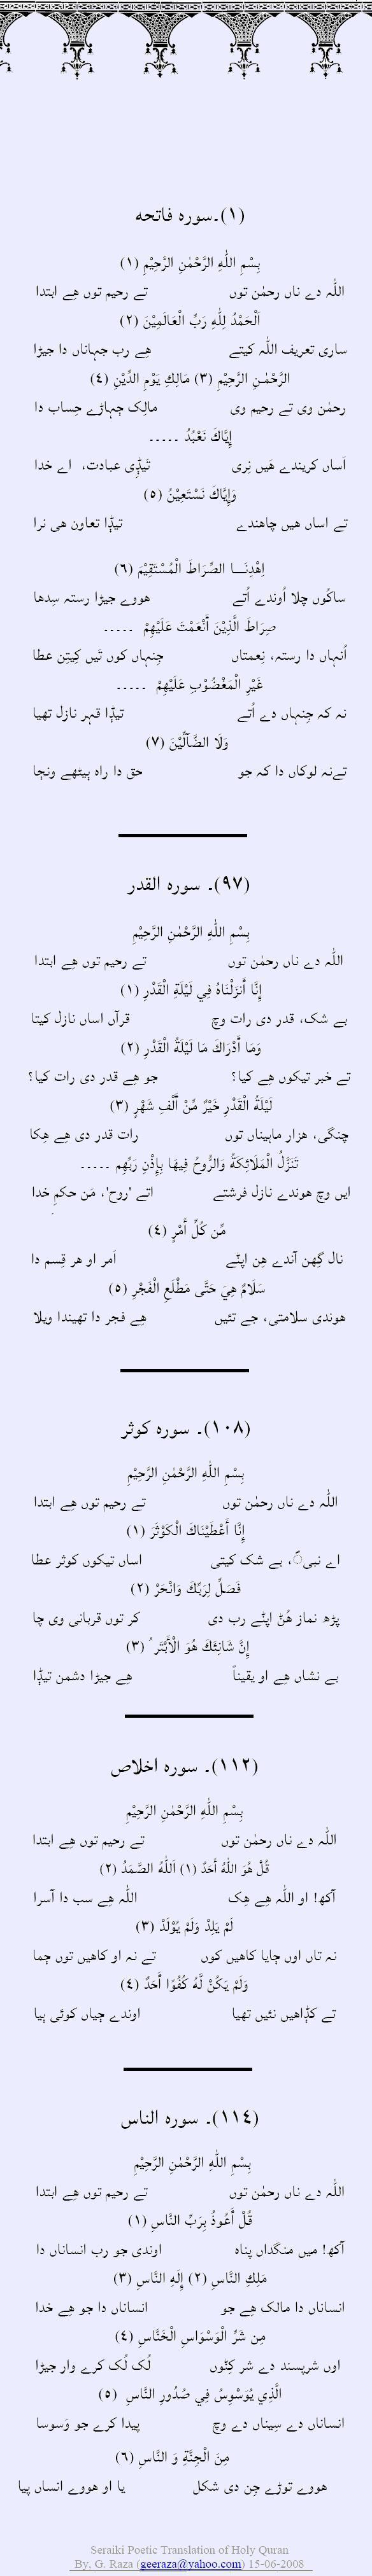 Quran Pak da Seraiki Sheri Terjama